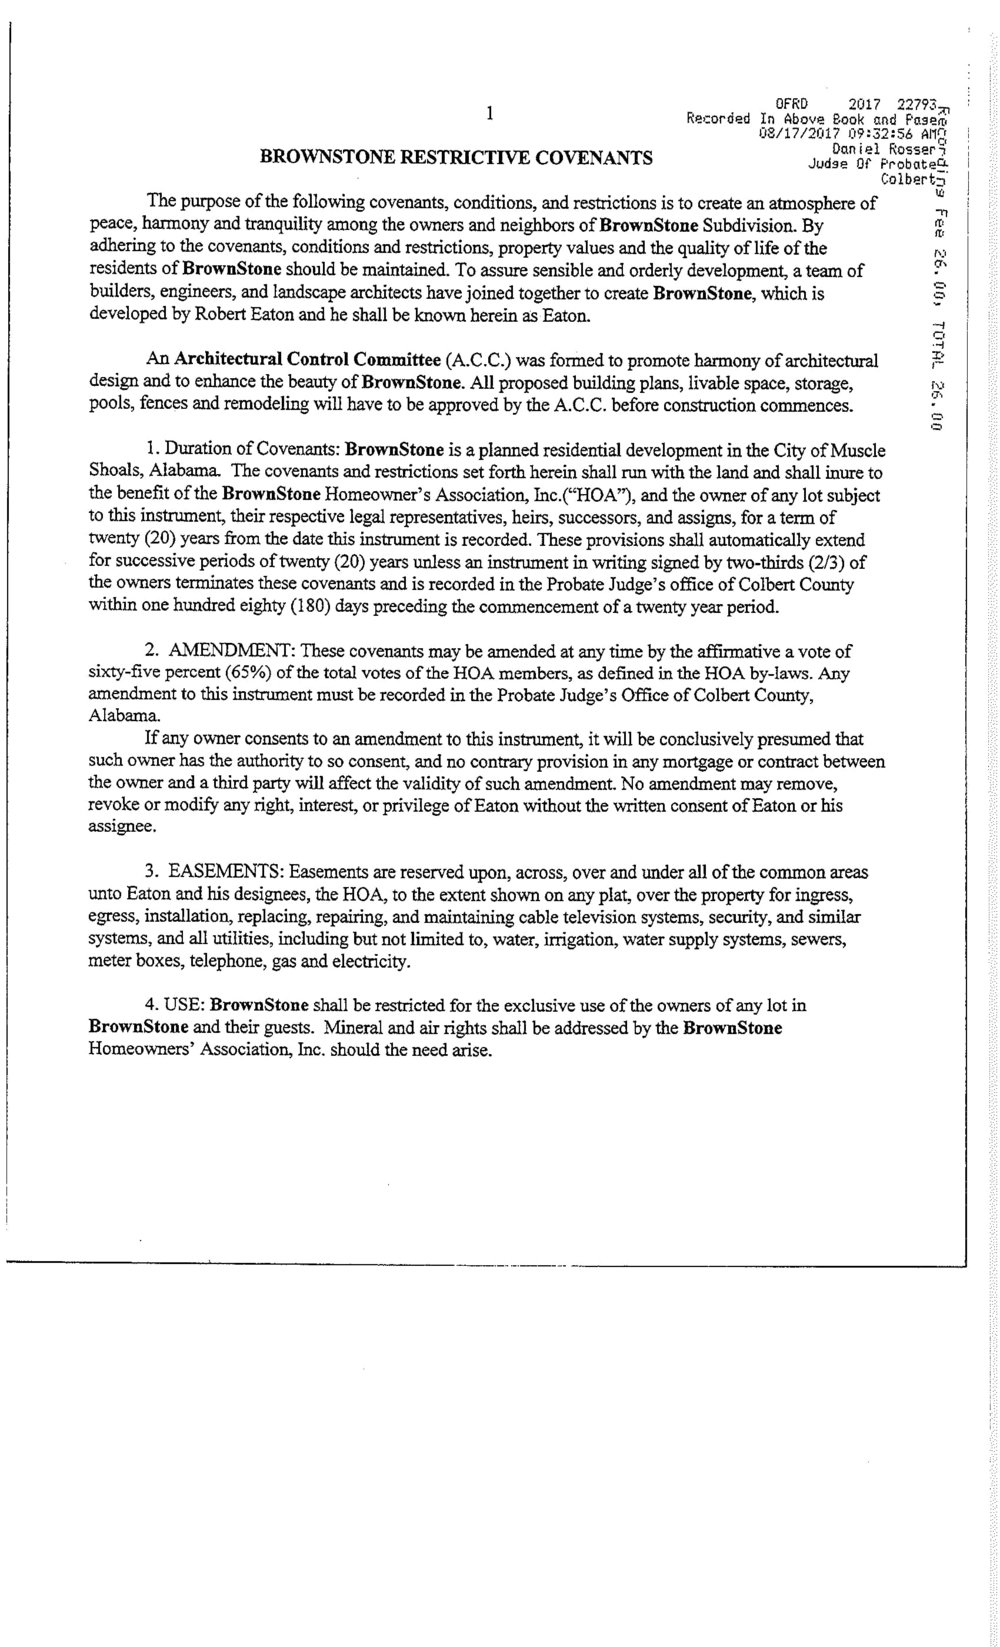 Covenants-Brownstone-Subdivision-1.jpg